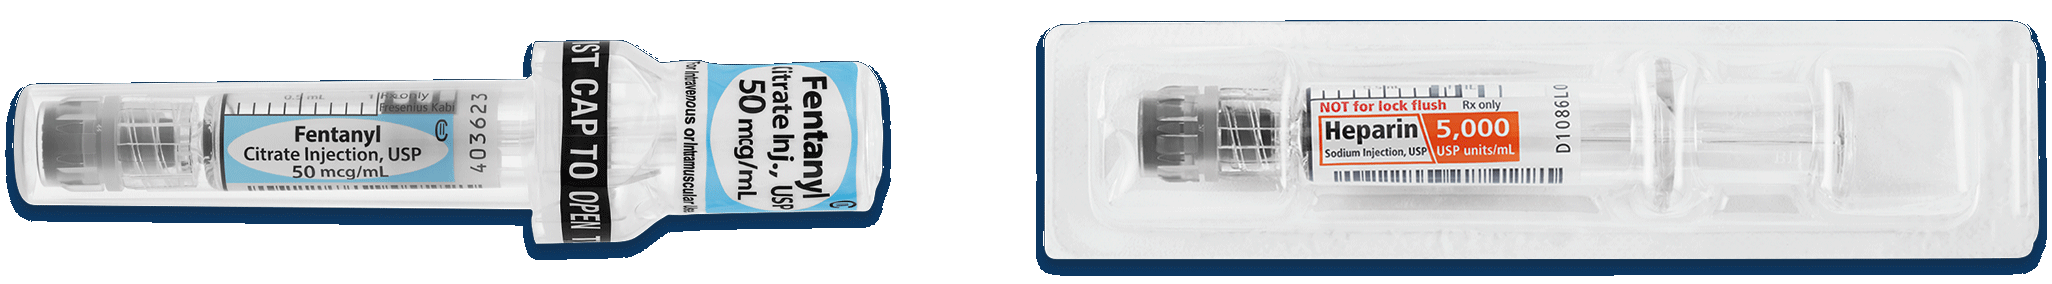 MicroVault Dilaudid 0.2 mg per 1 mL and Heparin 5,000 USP units per 1 mL image